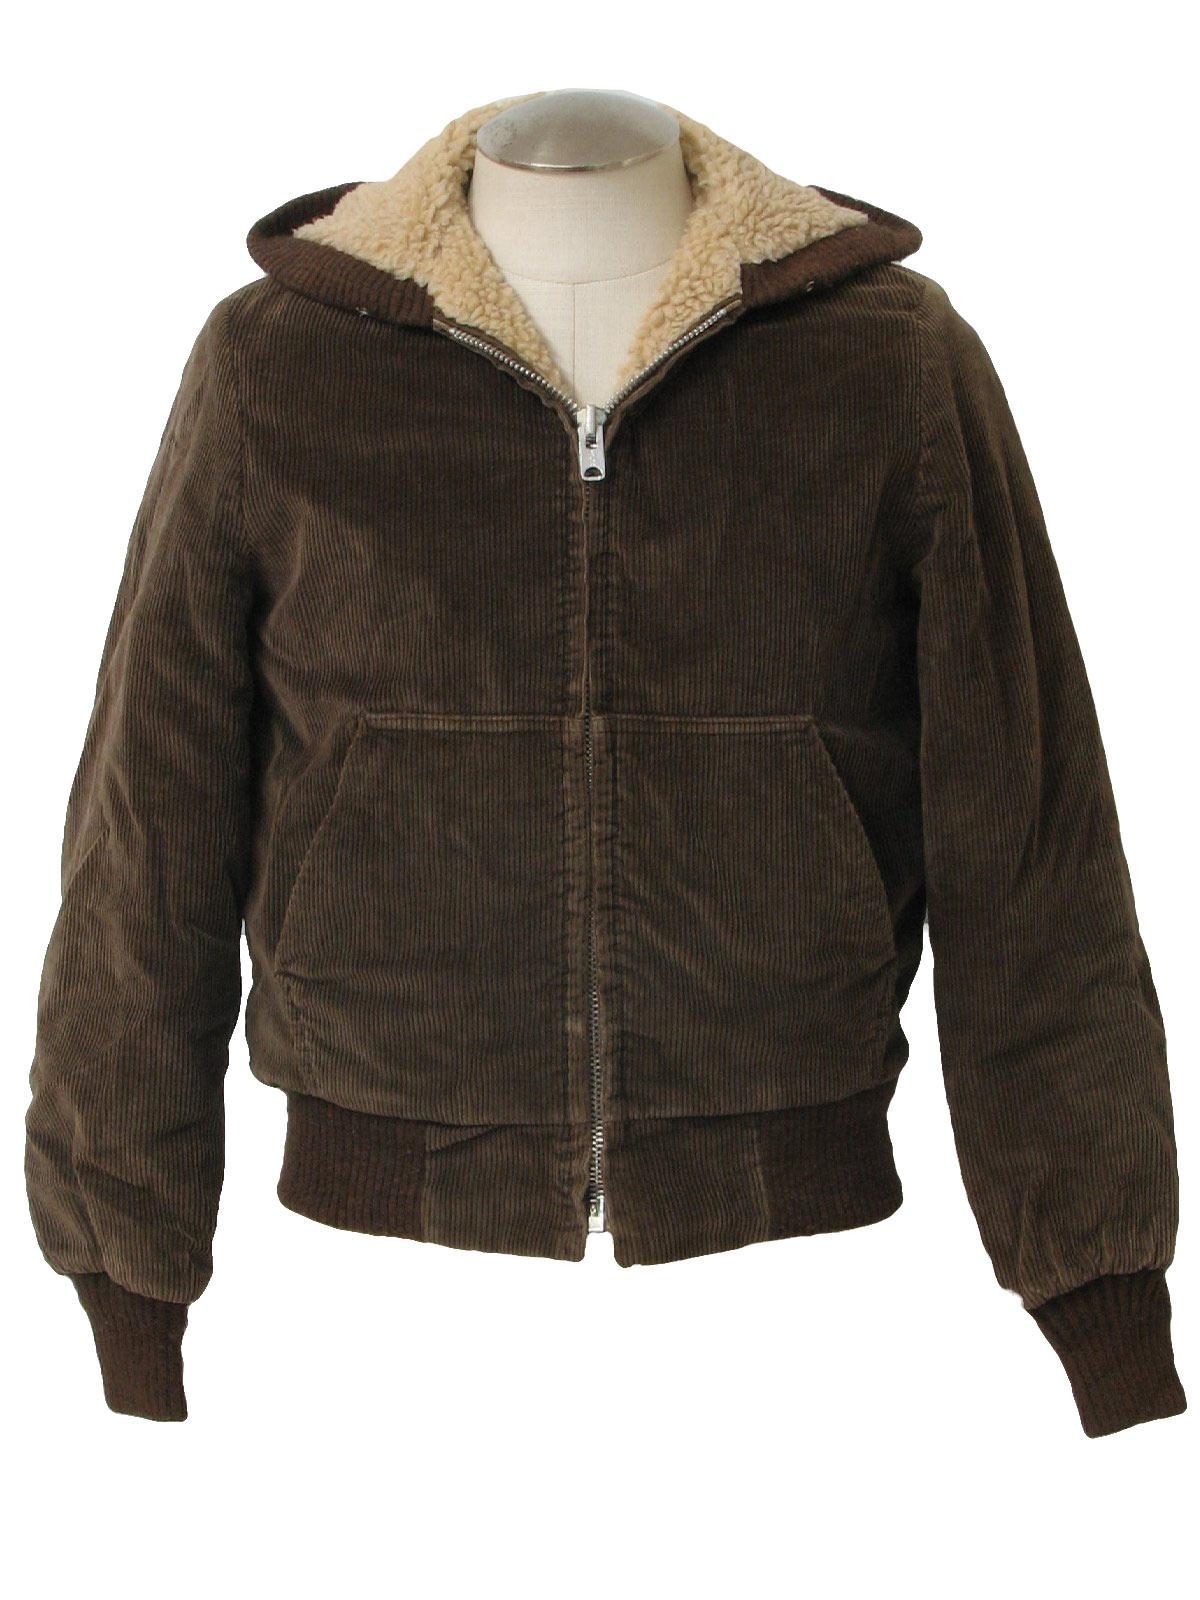 1980s Lee Wald Outerwear Jacket 80s Lee Wald Outerwear